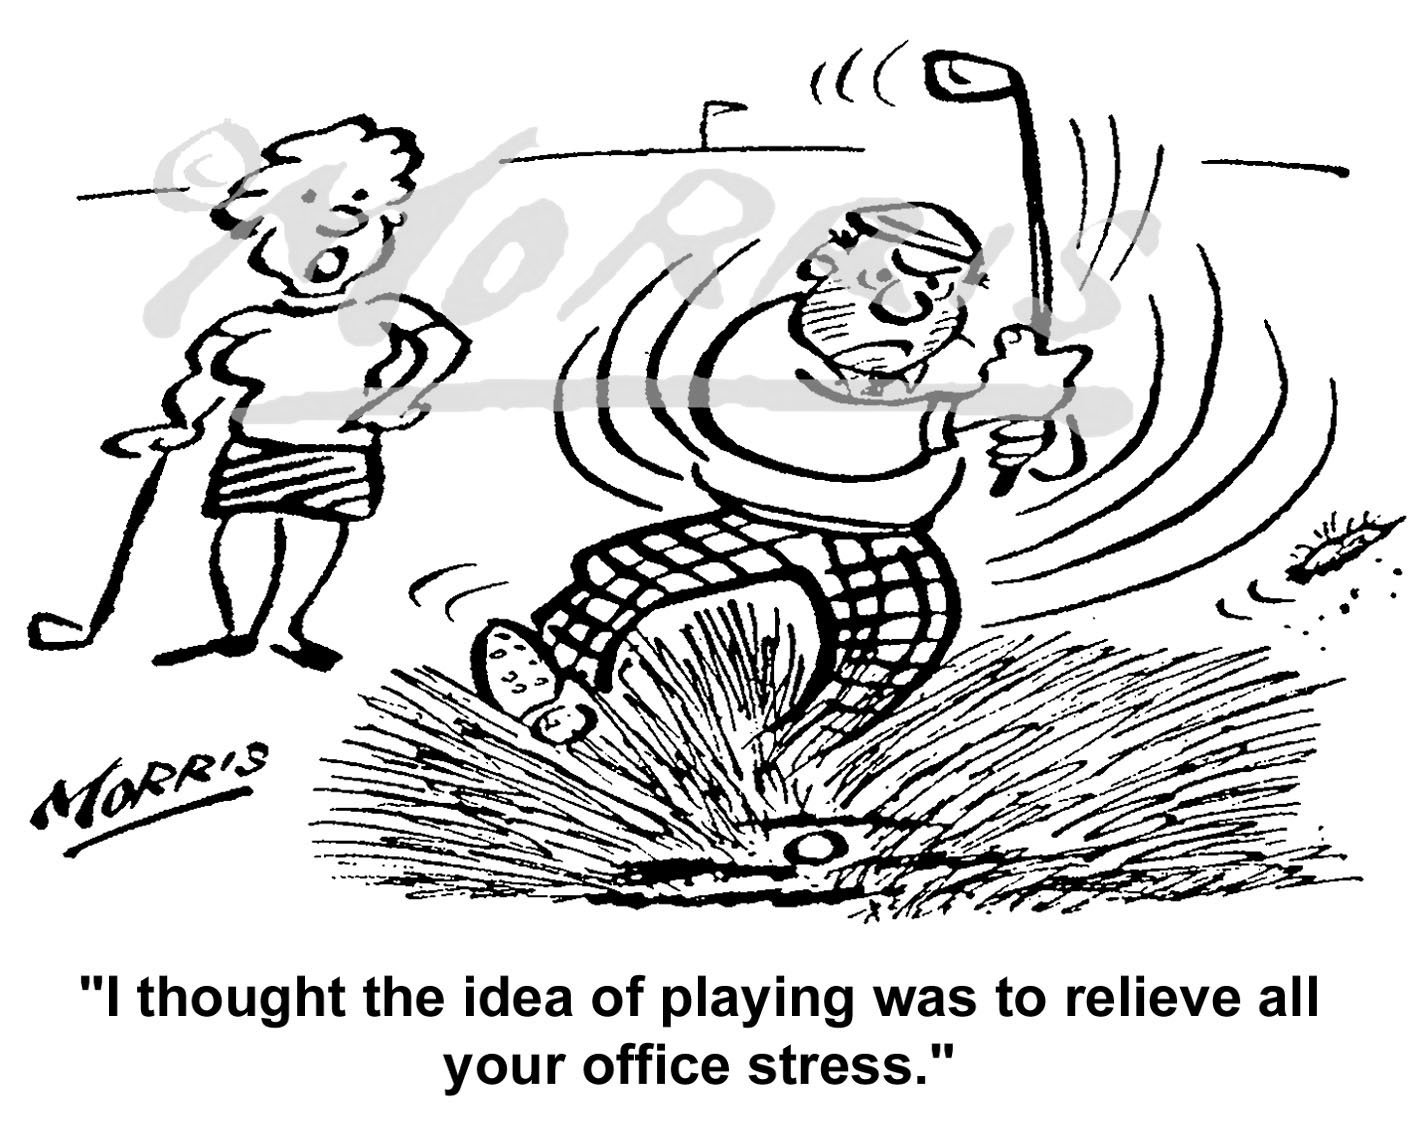 Stress cartoon, office cartoon, workplace cartoon, Golf cartoon, Golfing cartoon – Ref: 5208bw